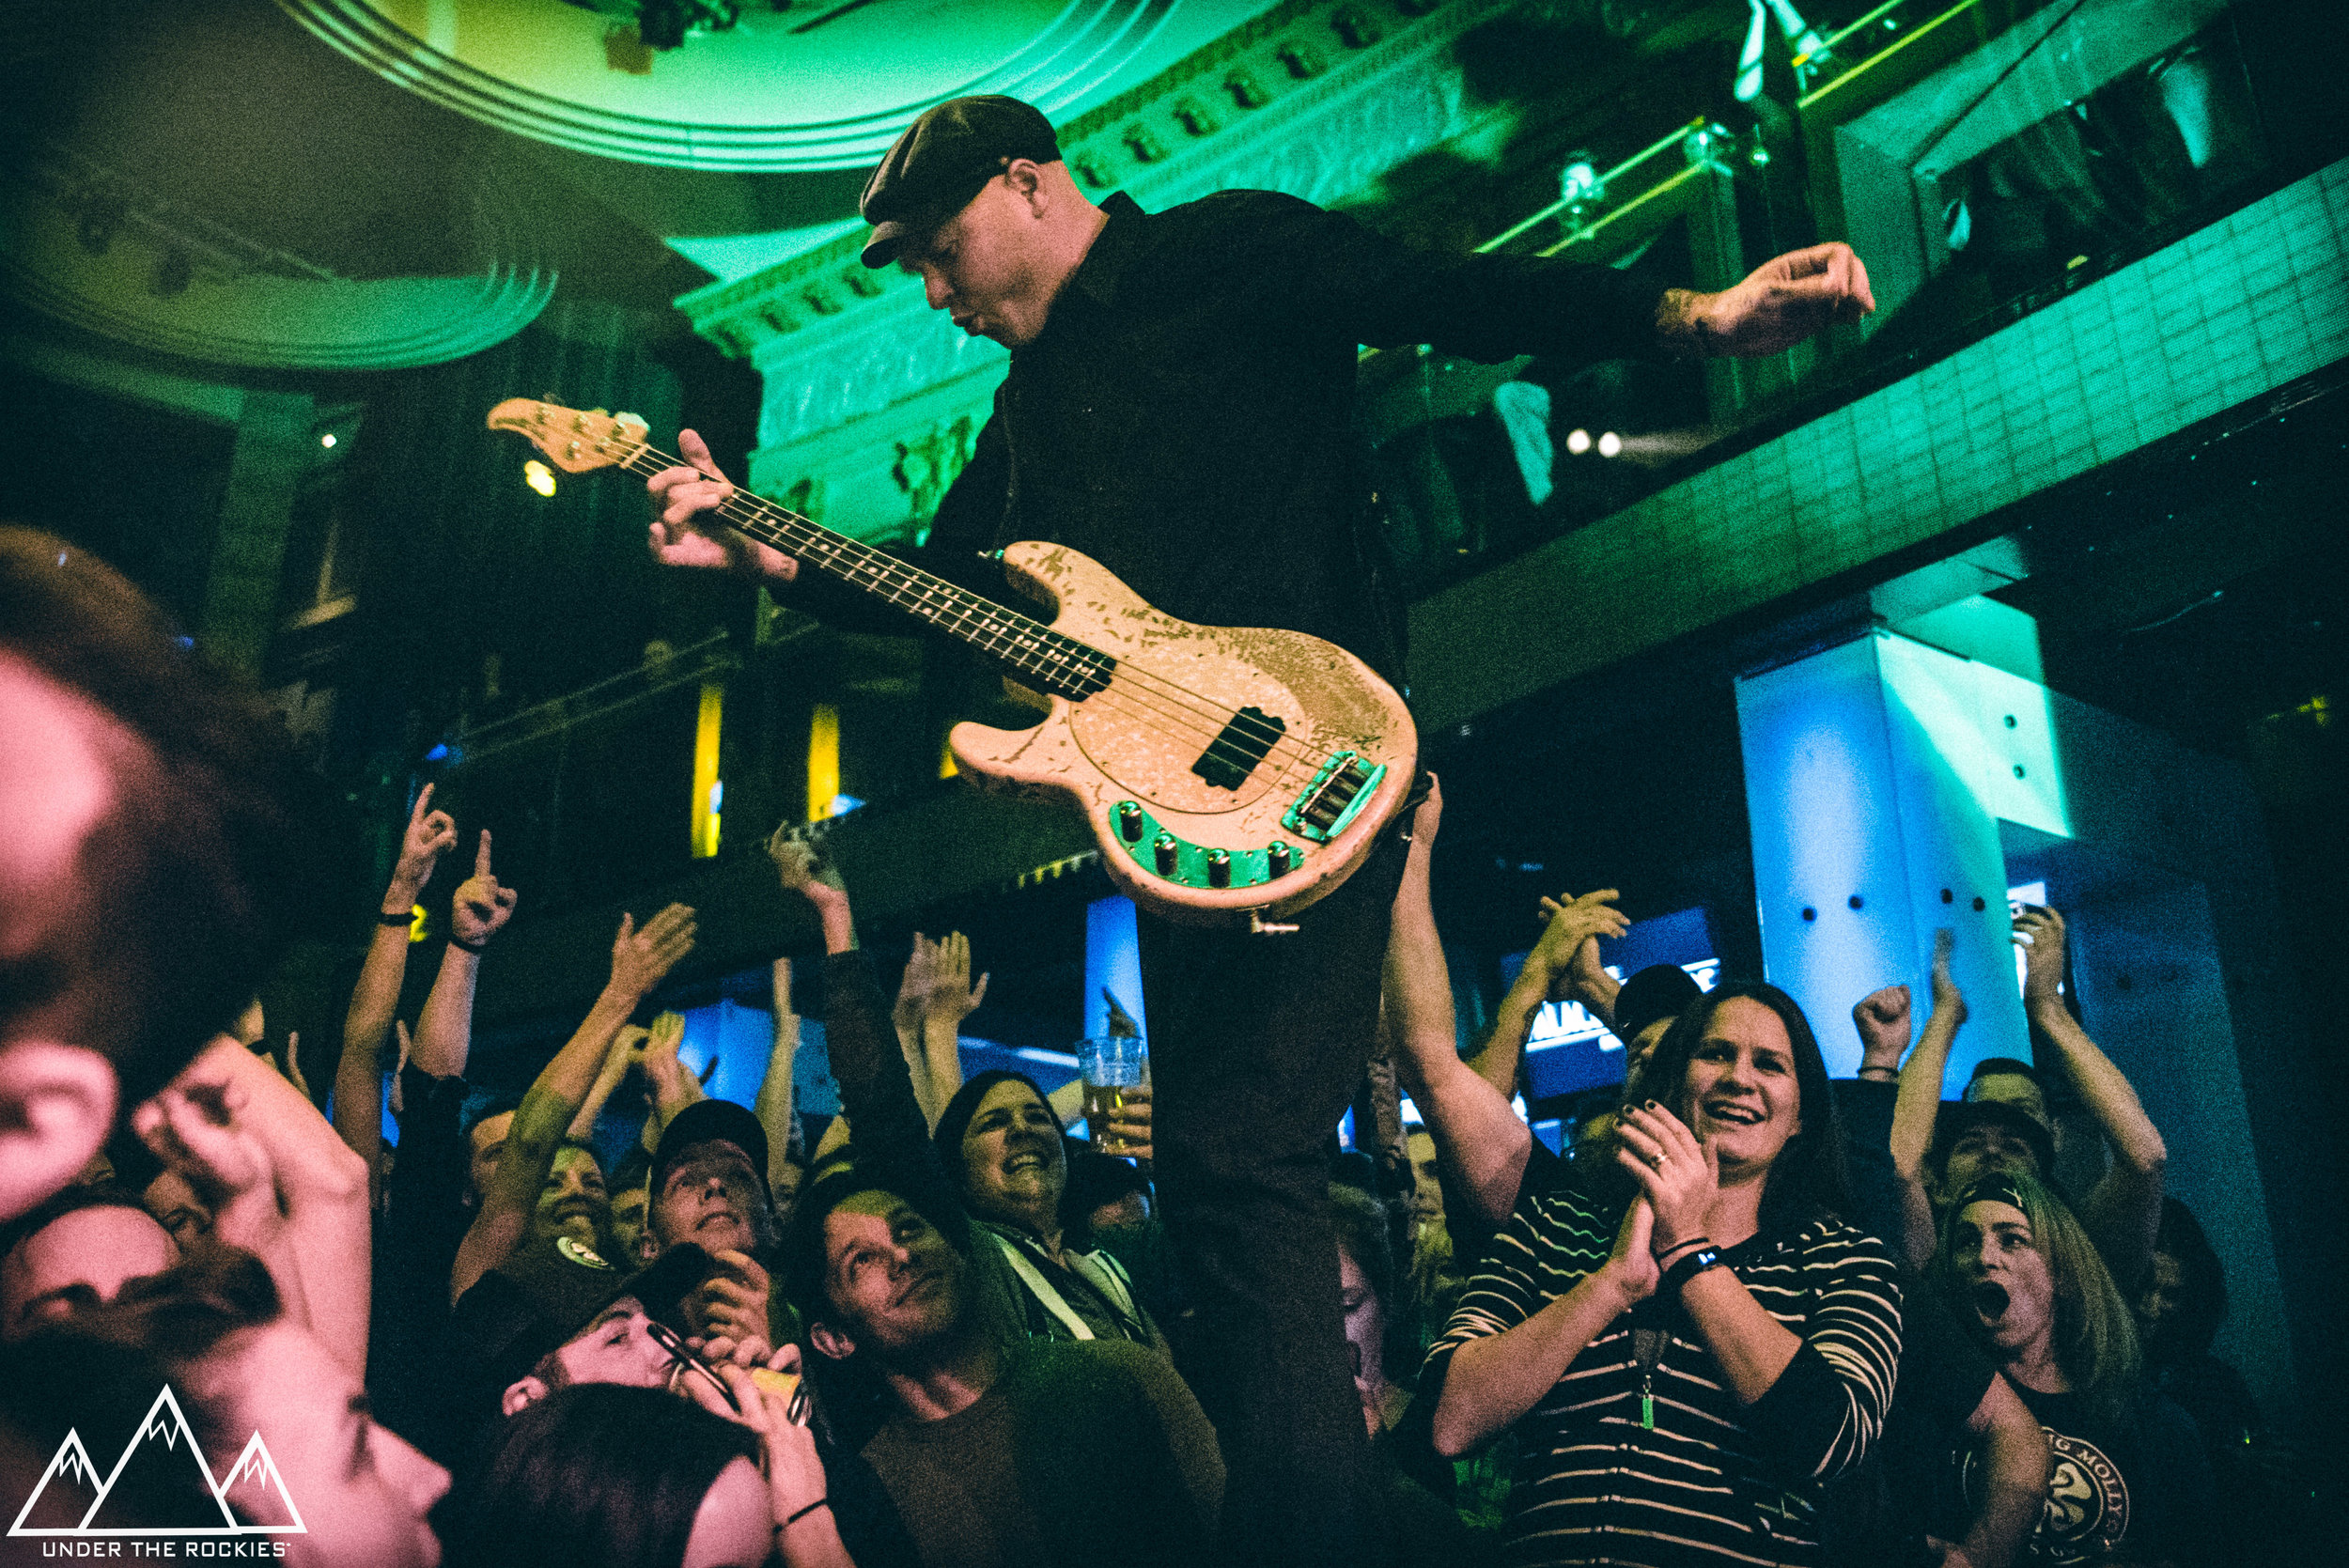 Nathen Maxwell performing in Calgary on October 20, 2017. Photo by Josh Platt.